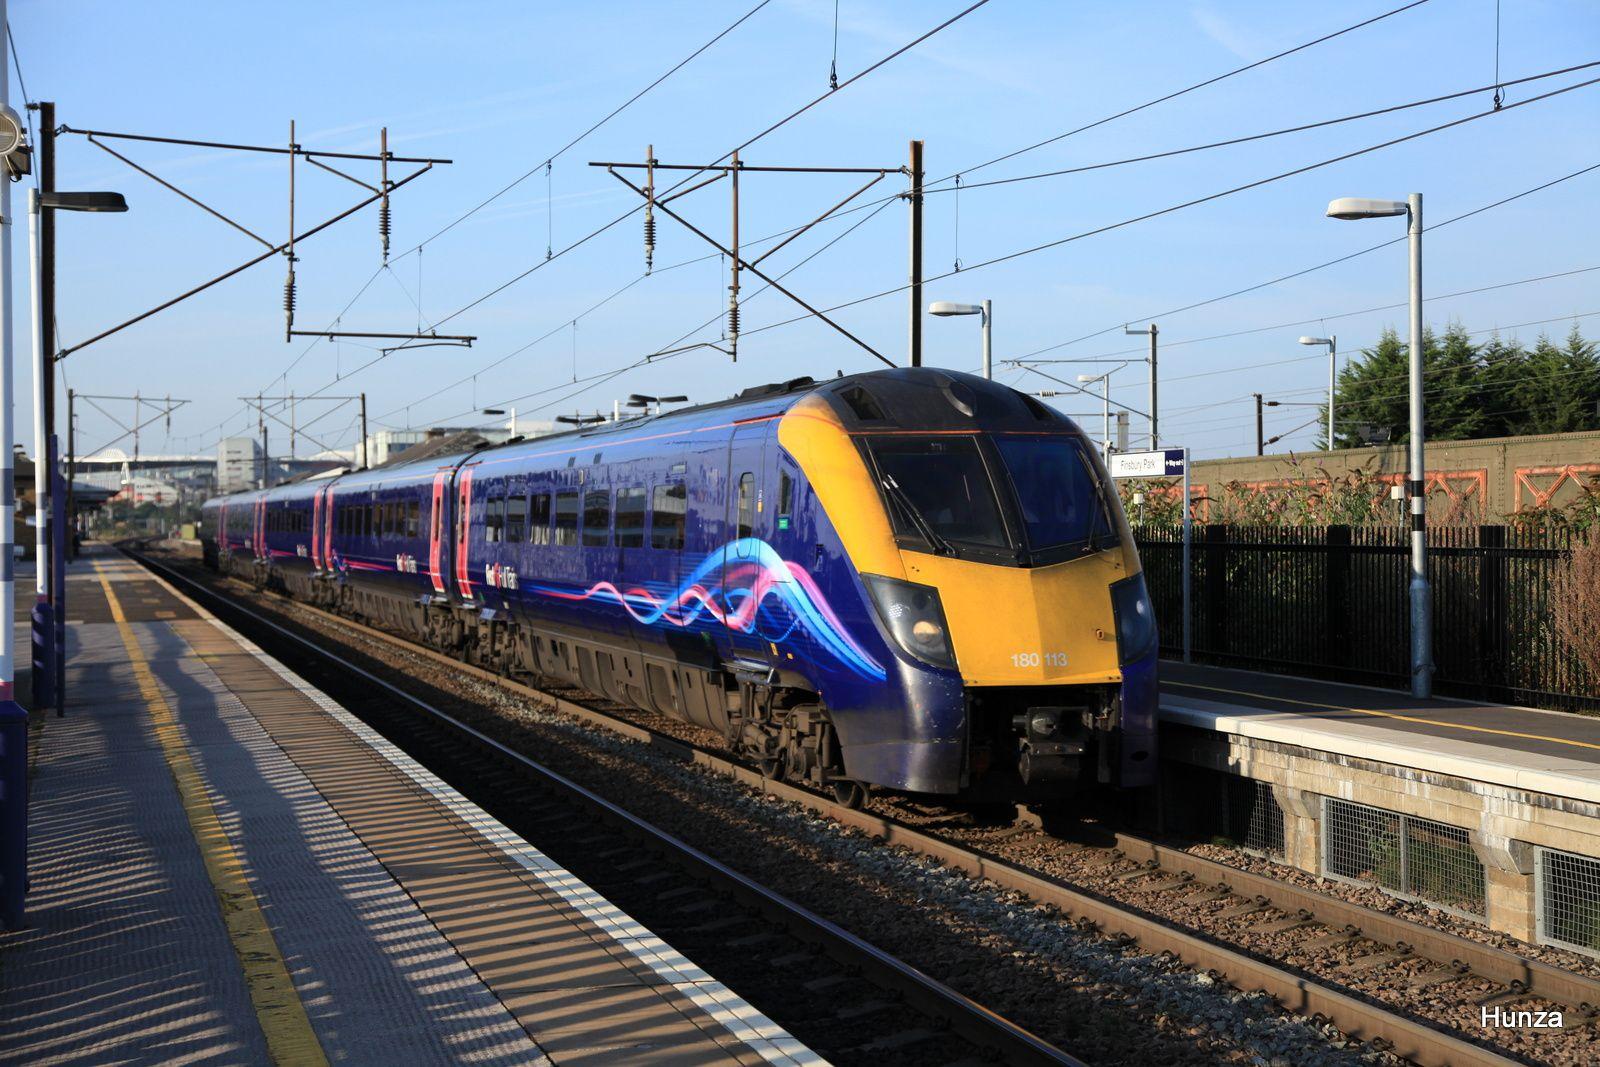 Class 180 de la First Hull Trainspassant à Finnsbury Park (31 juillet 2014)